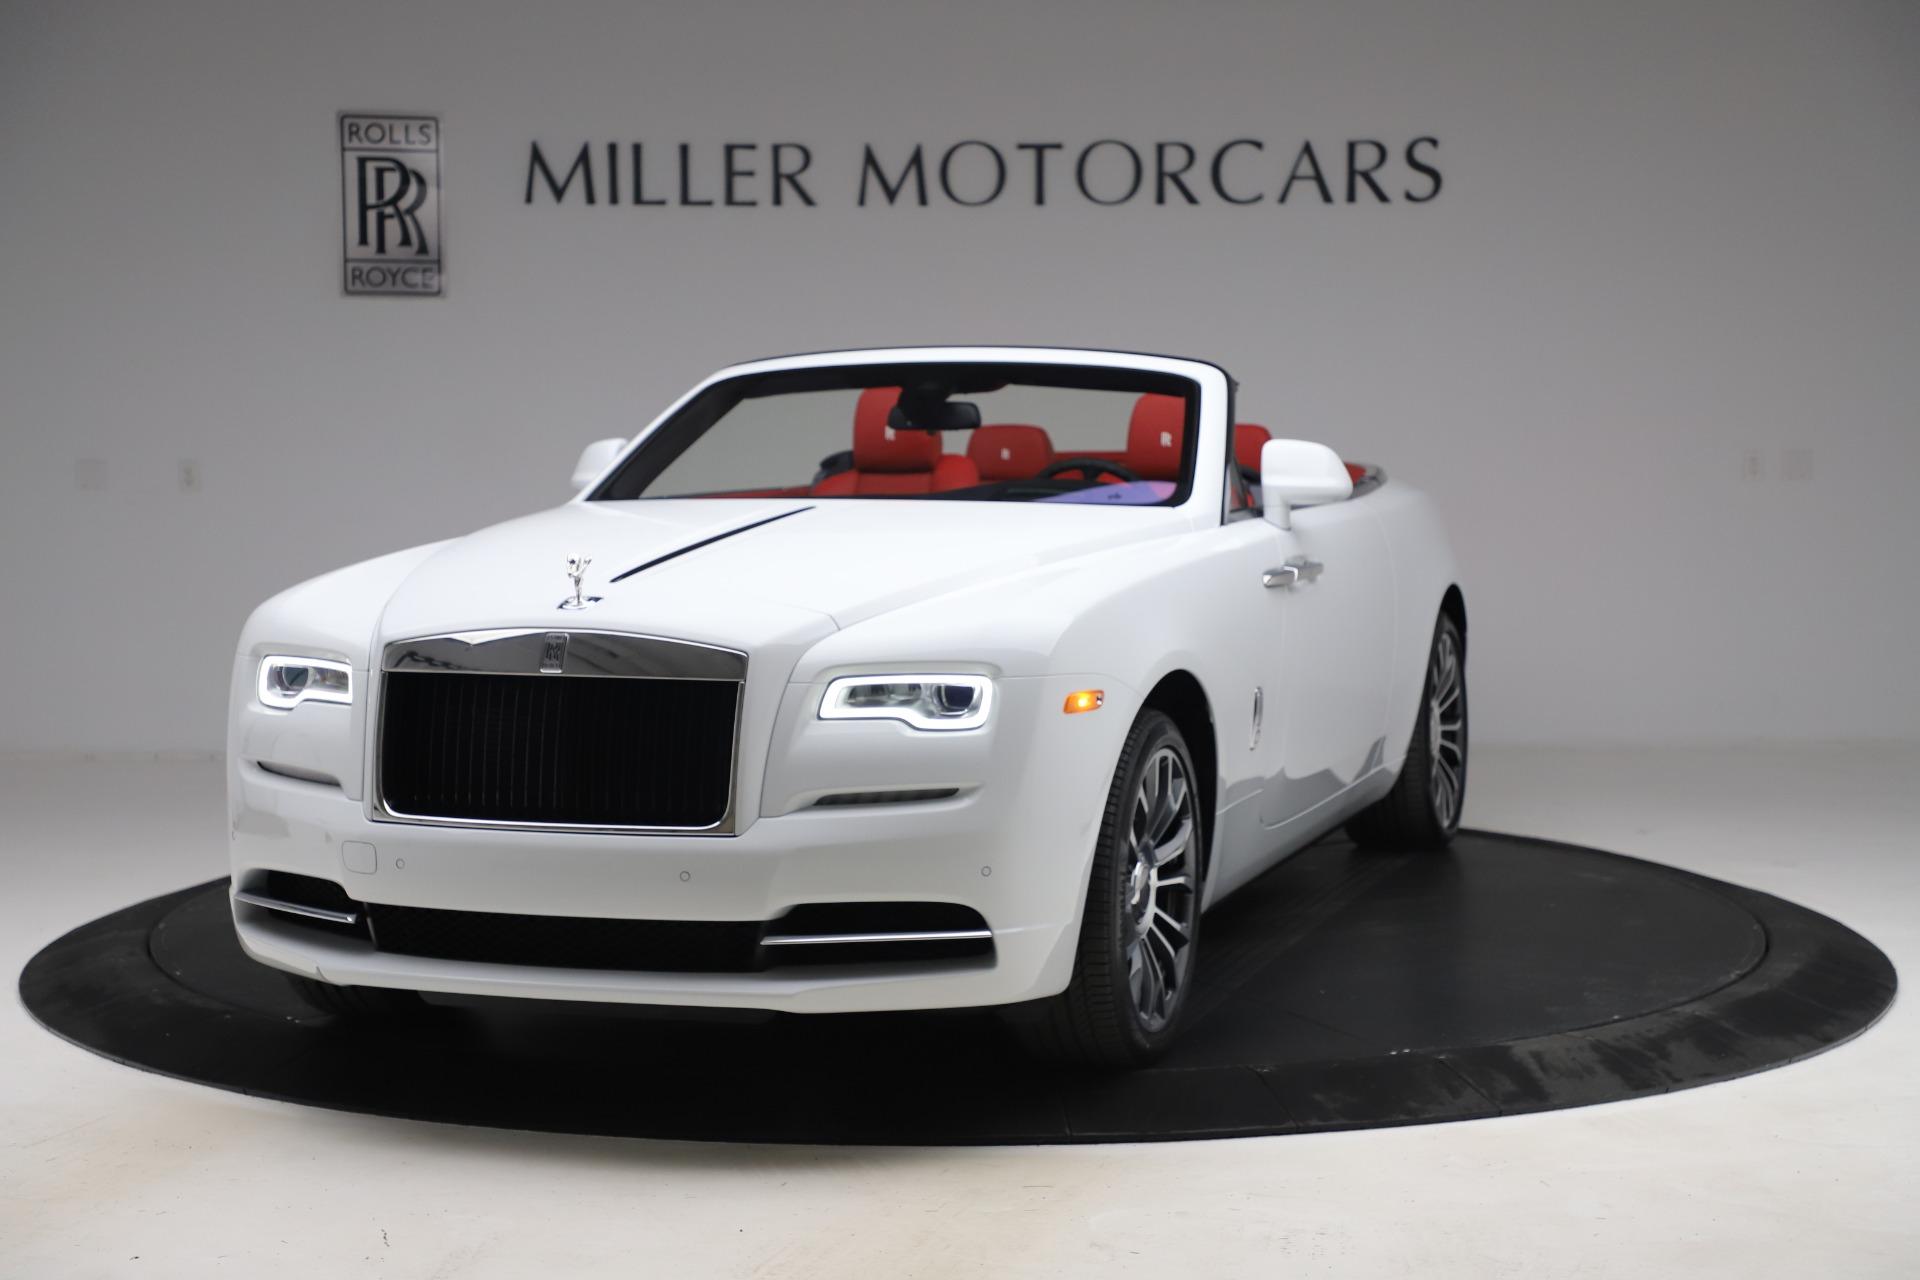 New 2020 Rolls-Royce Dawn for sale Sold at Bugatti of Greenwich in Greenwich CT 06830 1